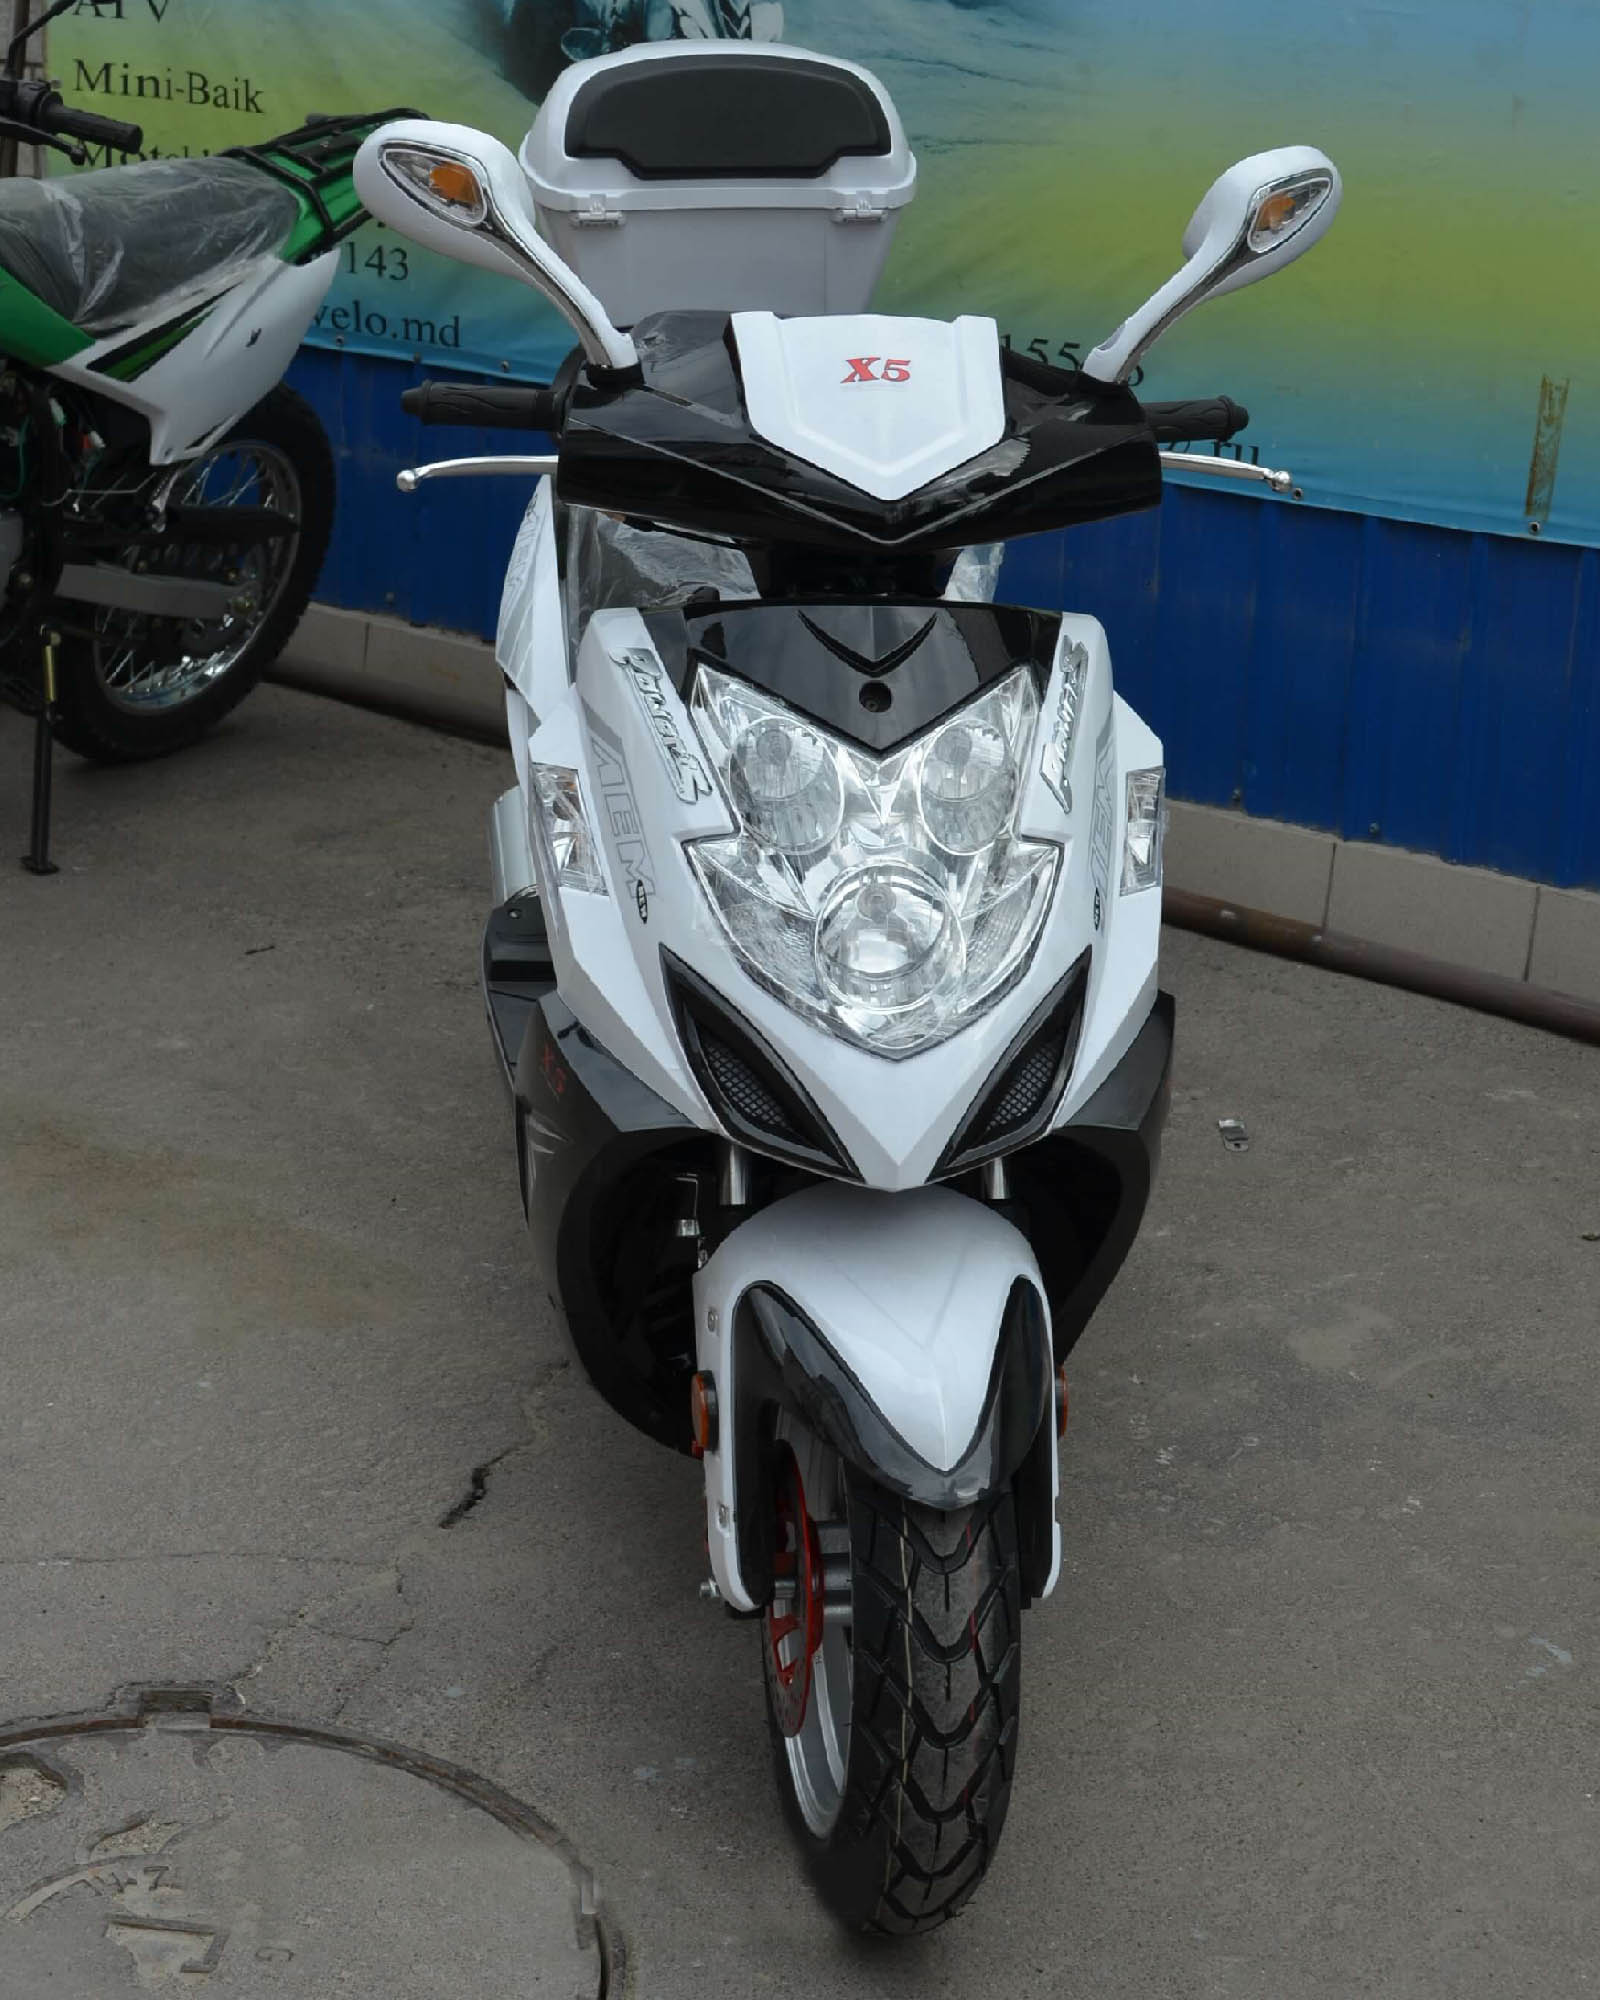 Скутер VS50QT-3 X5 цвет белый вид спереди купить по низкой цене